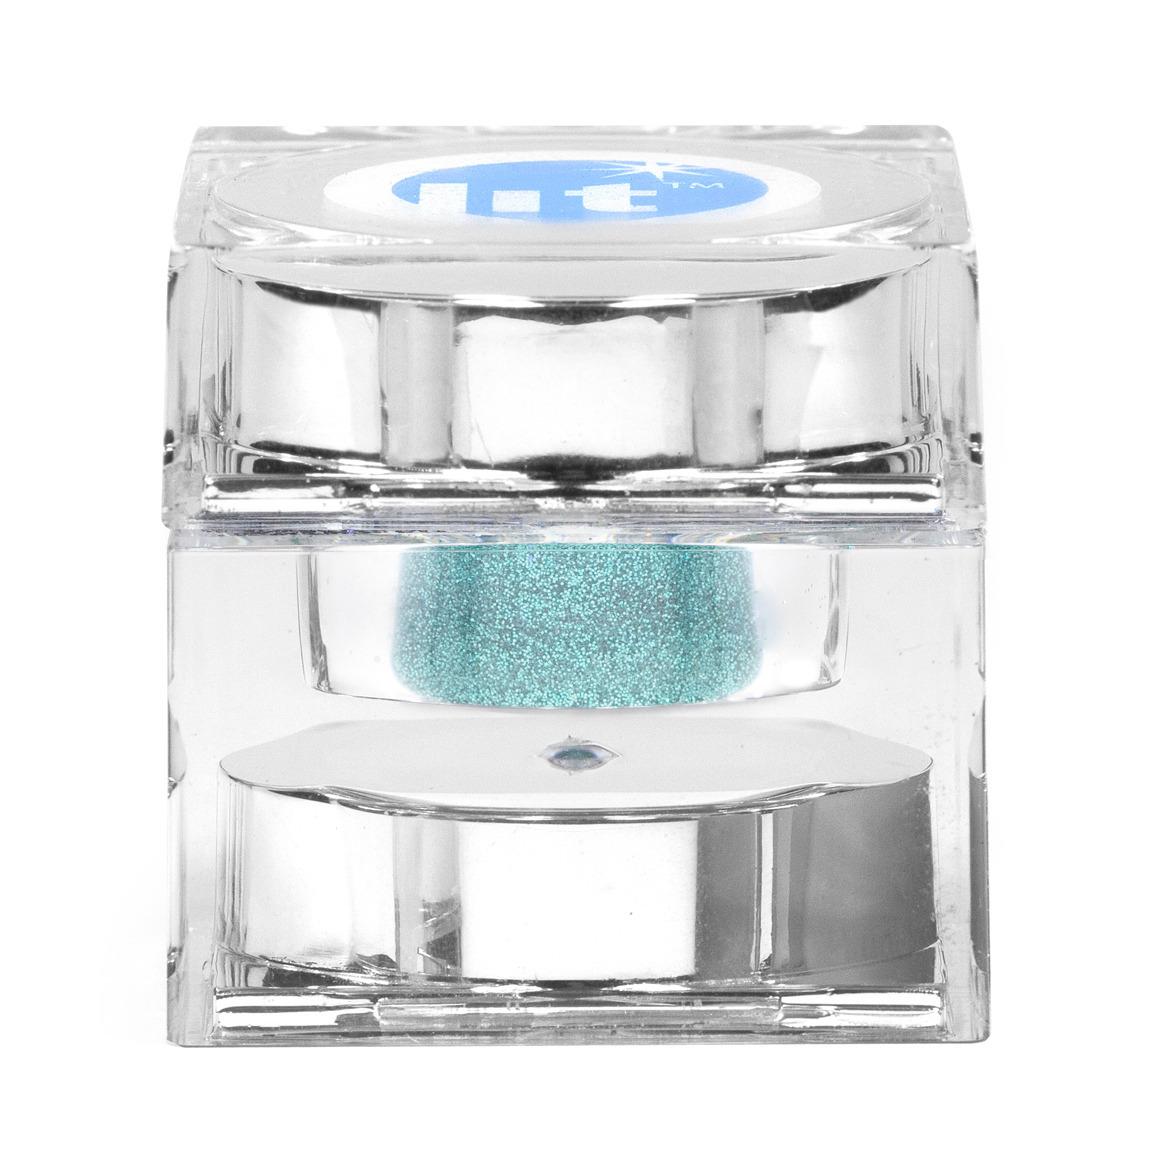 Lit Cosmetics Lit Glitter Cayman S2 (Solid) alternative view 1.